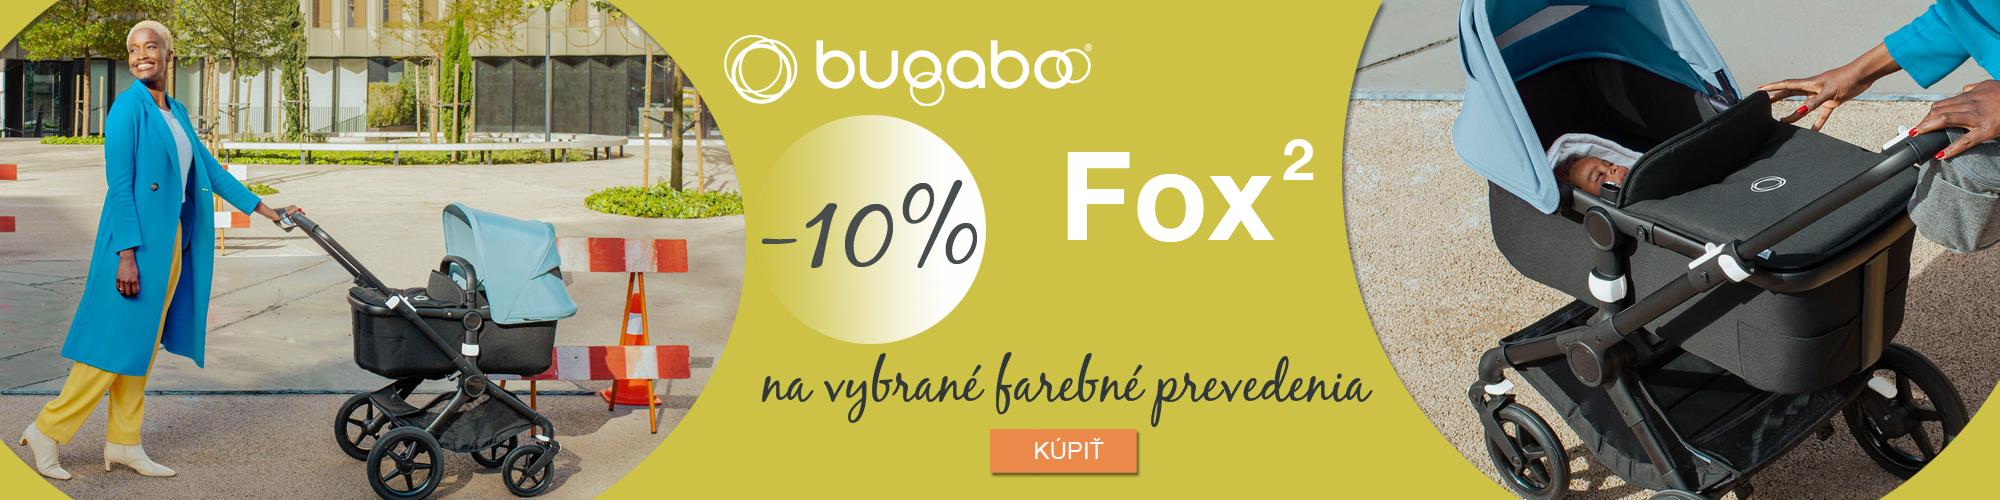 Bugaboo Fox2